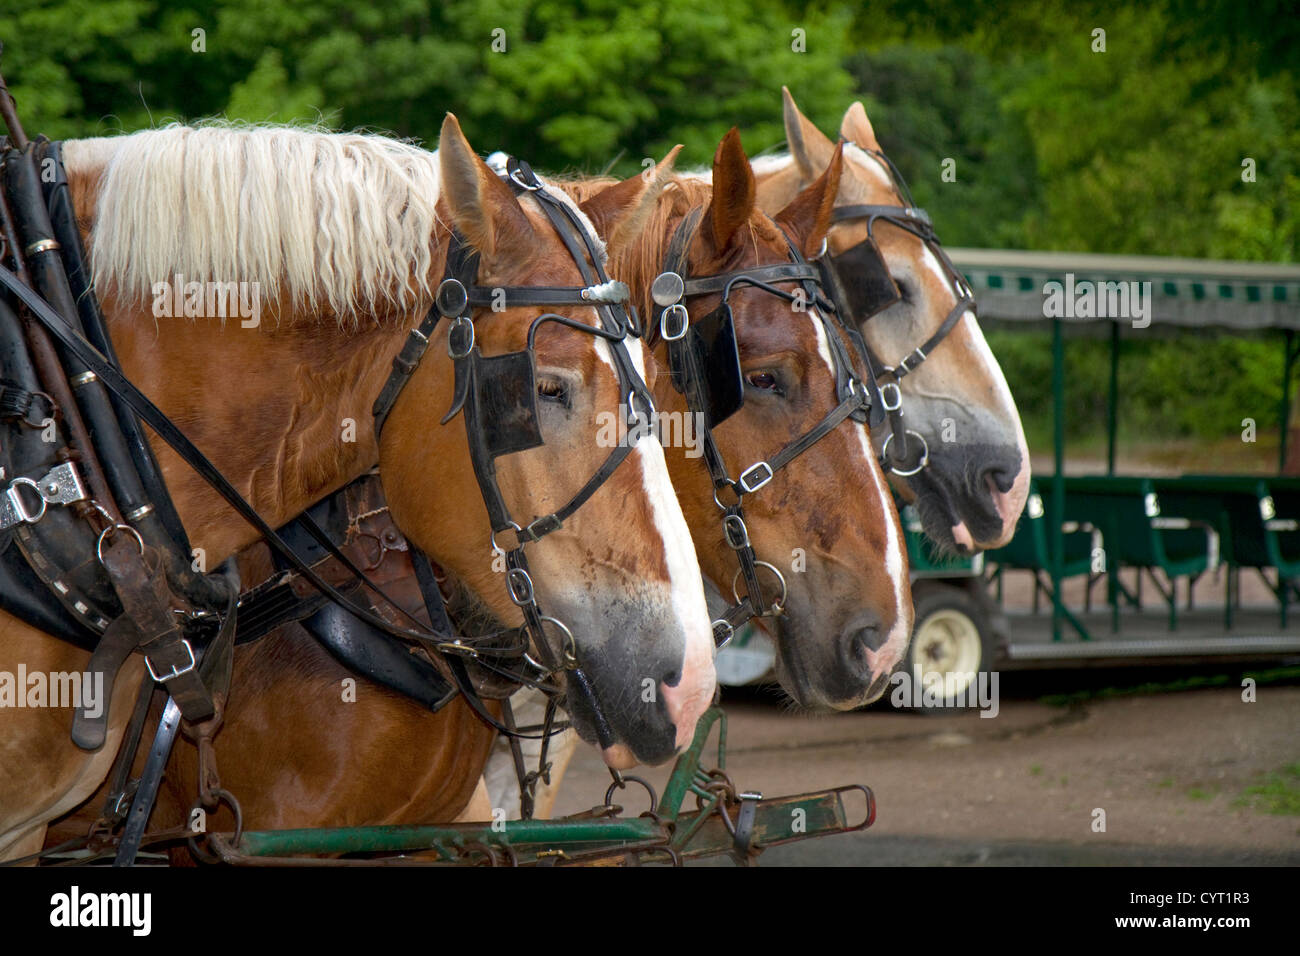 Draft horses on Mackinac Island located in Lake Huron, Michigan, USA. - Stock Image